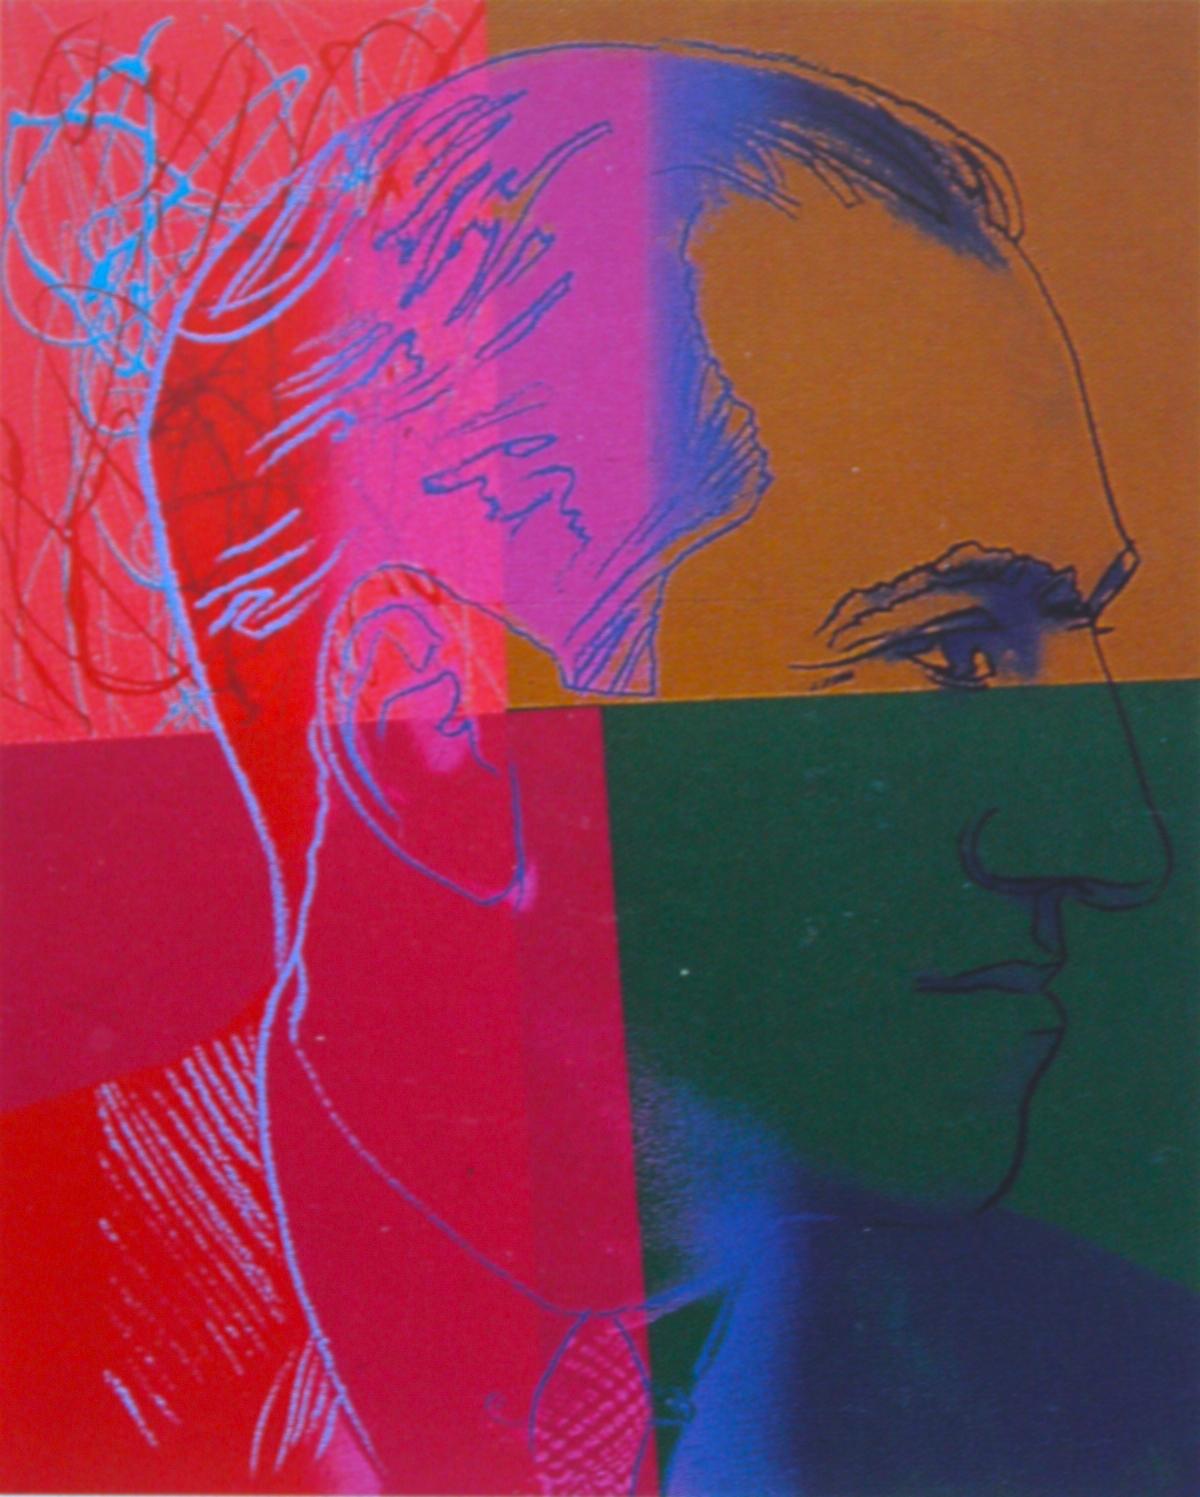 George Gershwin by Warhol